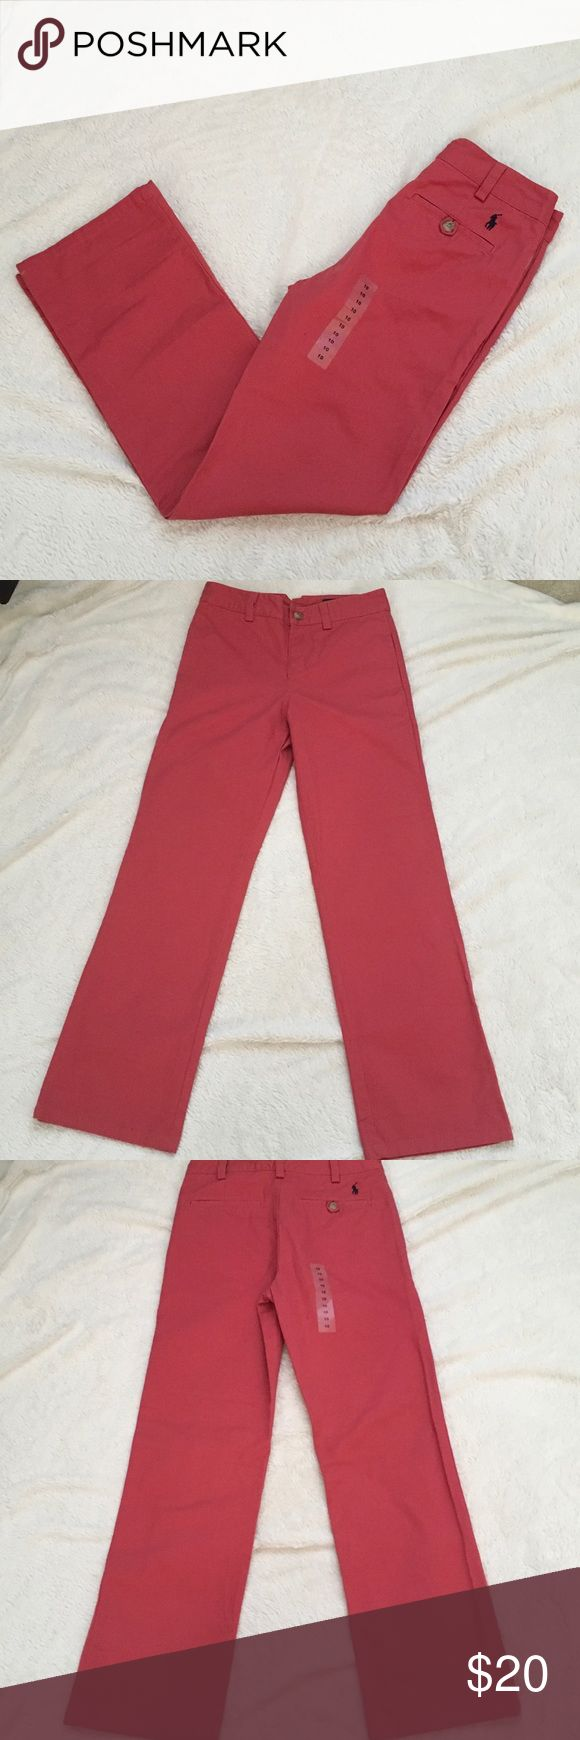 Ralph Lauren Polo - Girls Pants 10 Salmon colored - girls size 10 pants 💋 Polo by Ralph Lauren Bottoms Casual